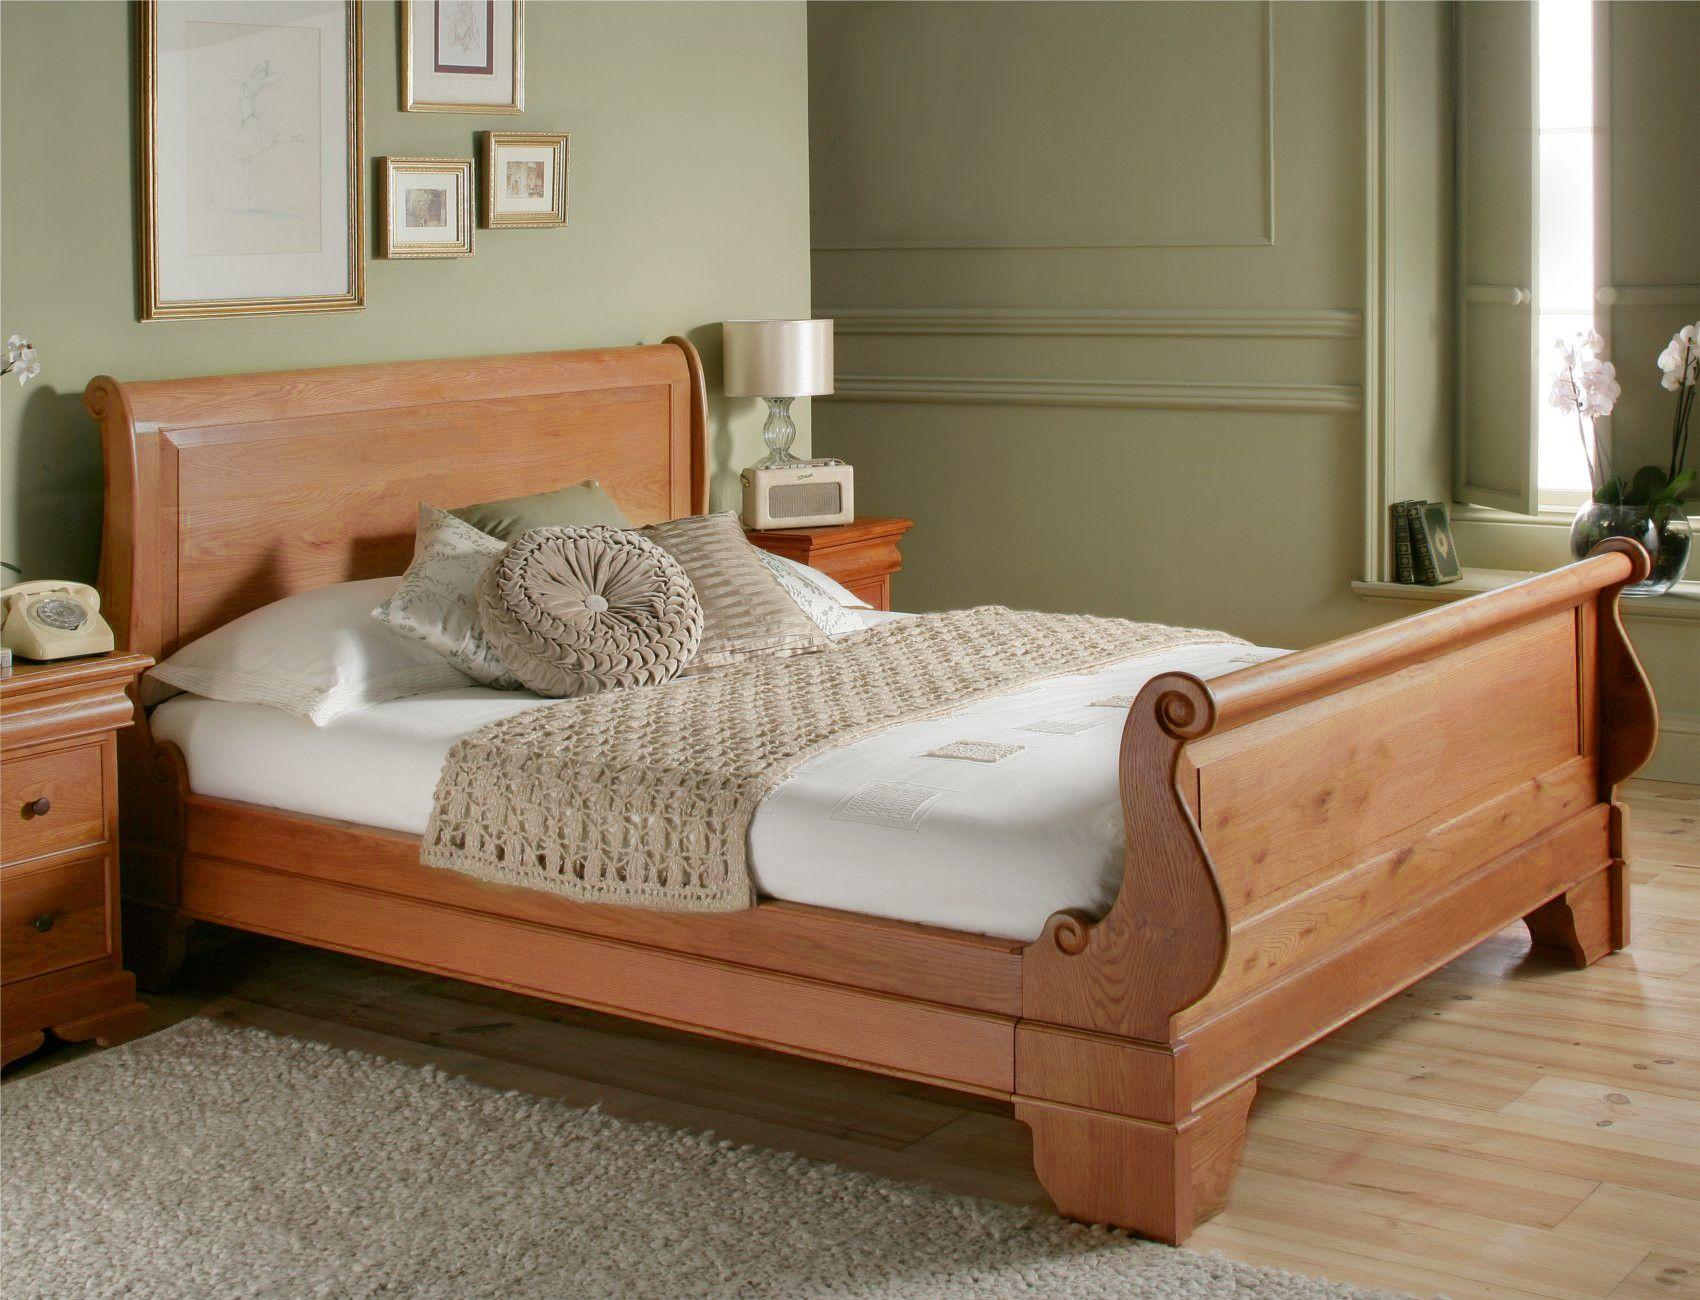 Super Toulouse Oak Wooden Sleigh Bed Light Wood Wooden Beds Andrewgaddart Wooden Chair Designs For Living Room Andrewgaddartcom